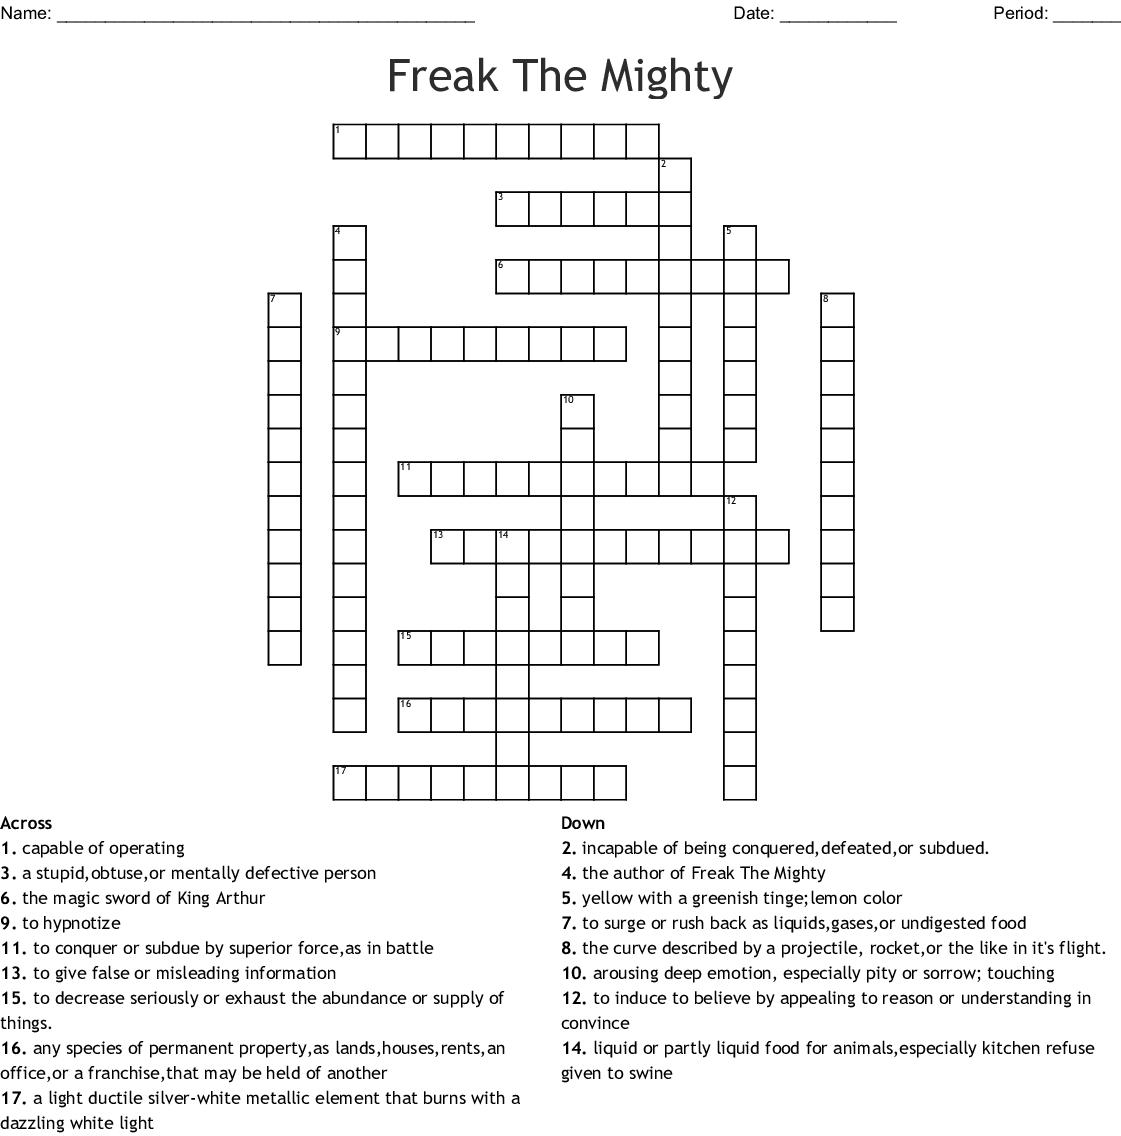 Freak The Mighty 5 7 Vocabulary Crossword